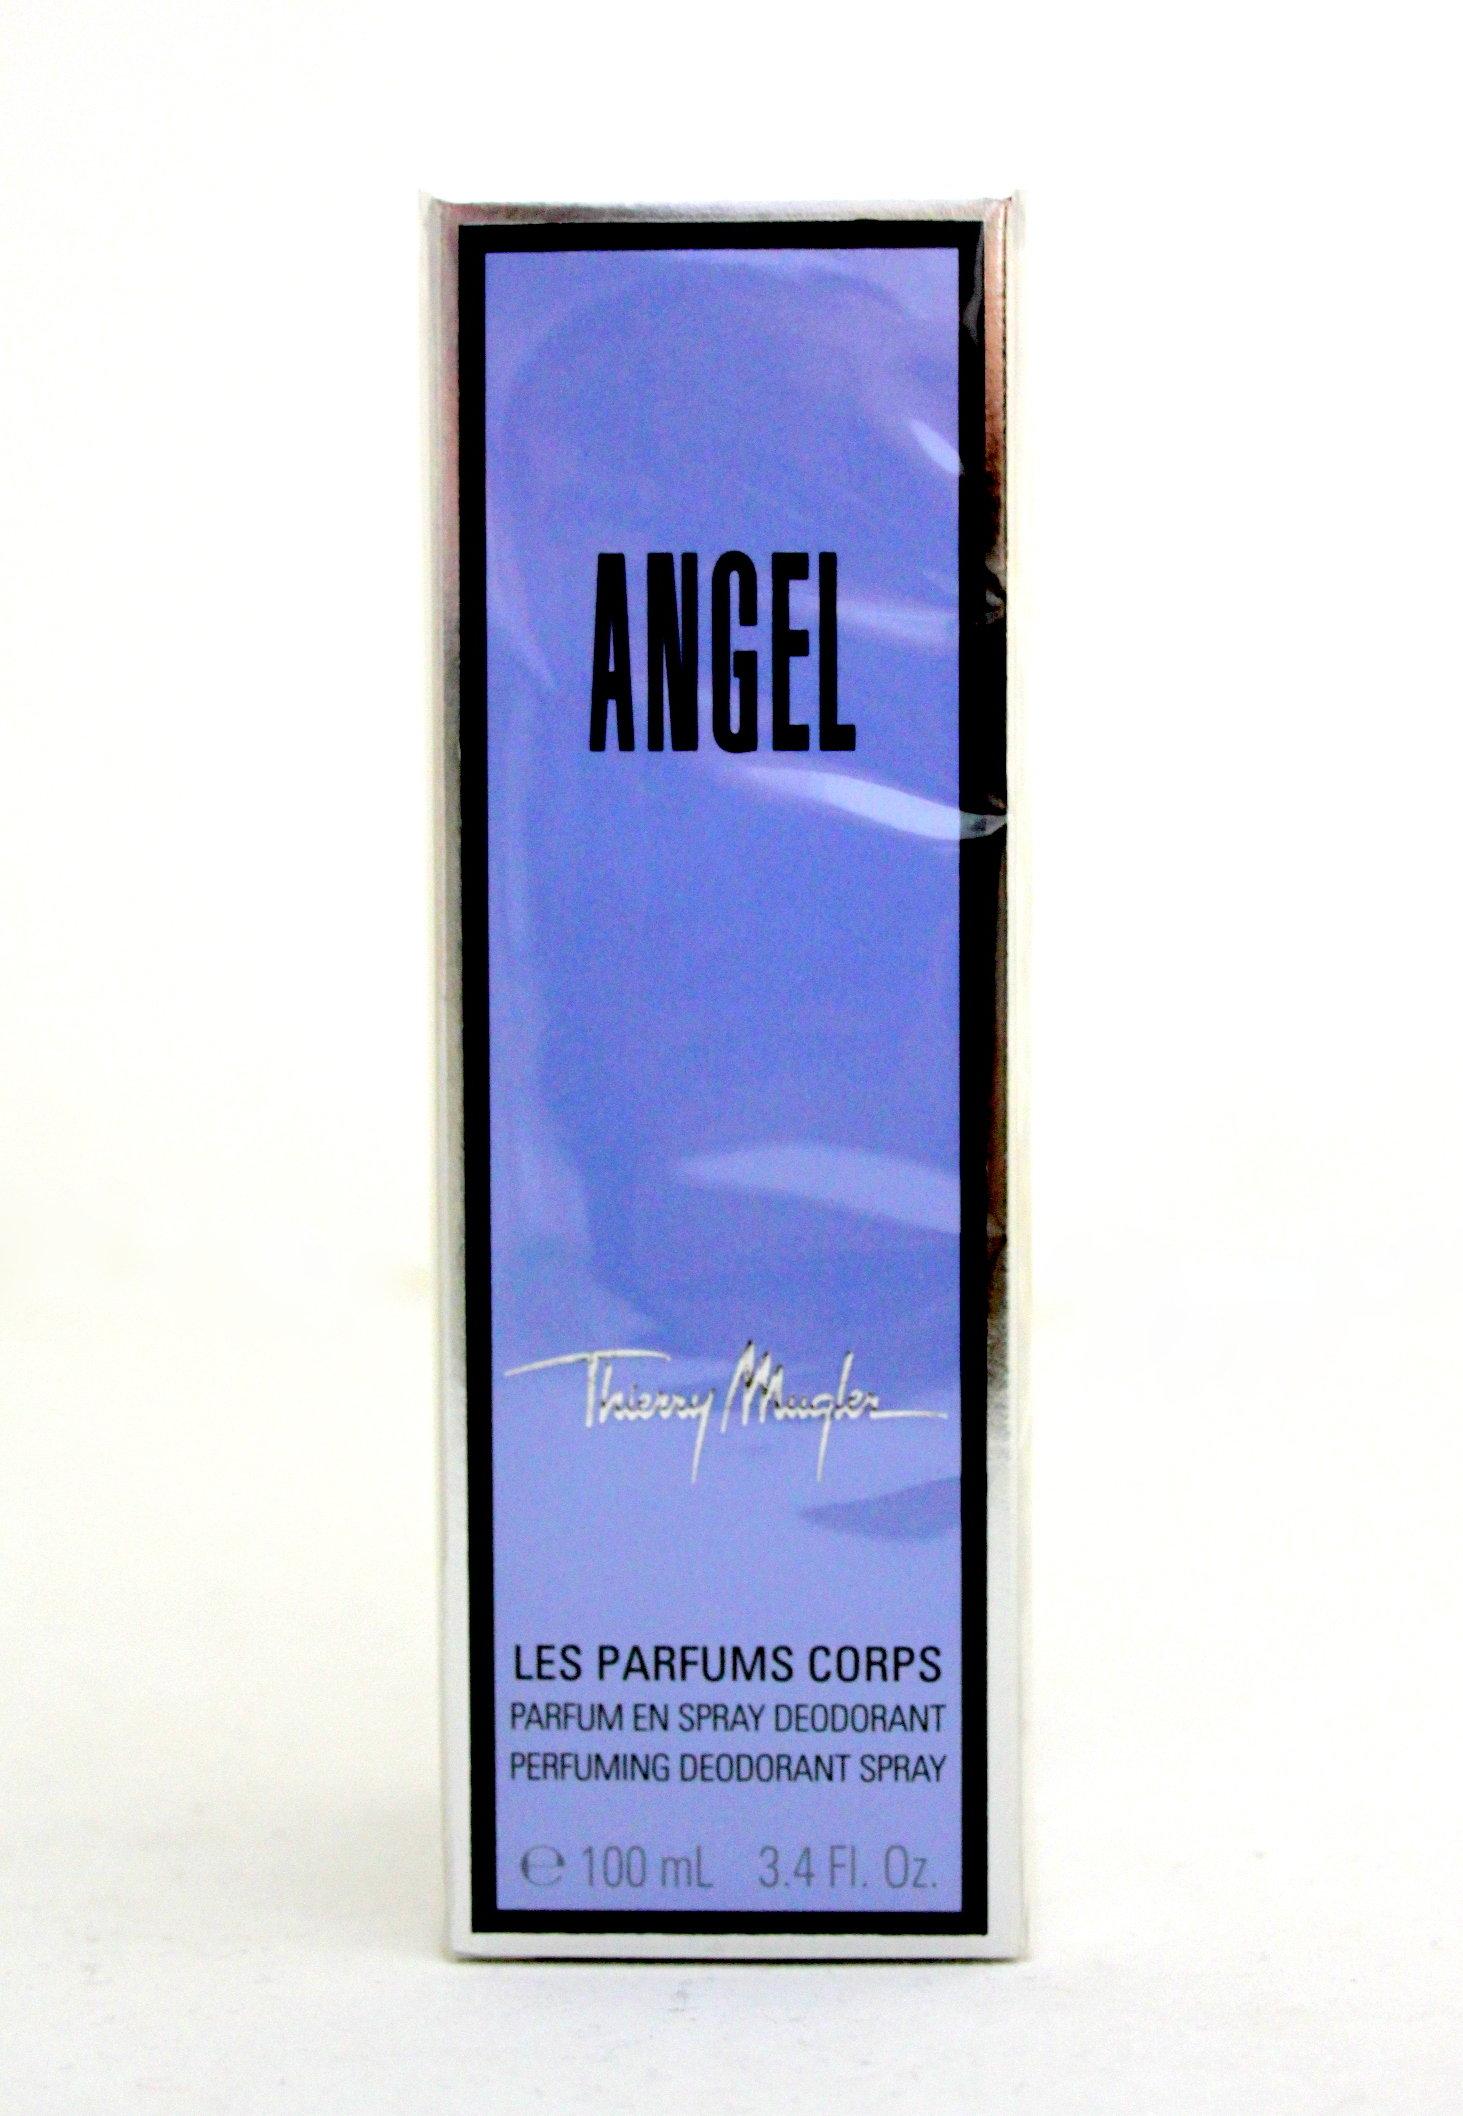 Thierry Mugler Angel Deodorant Spray